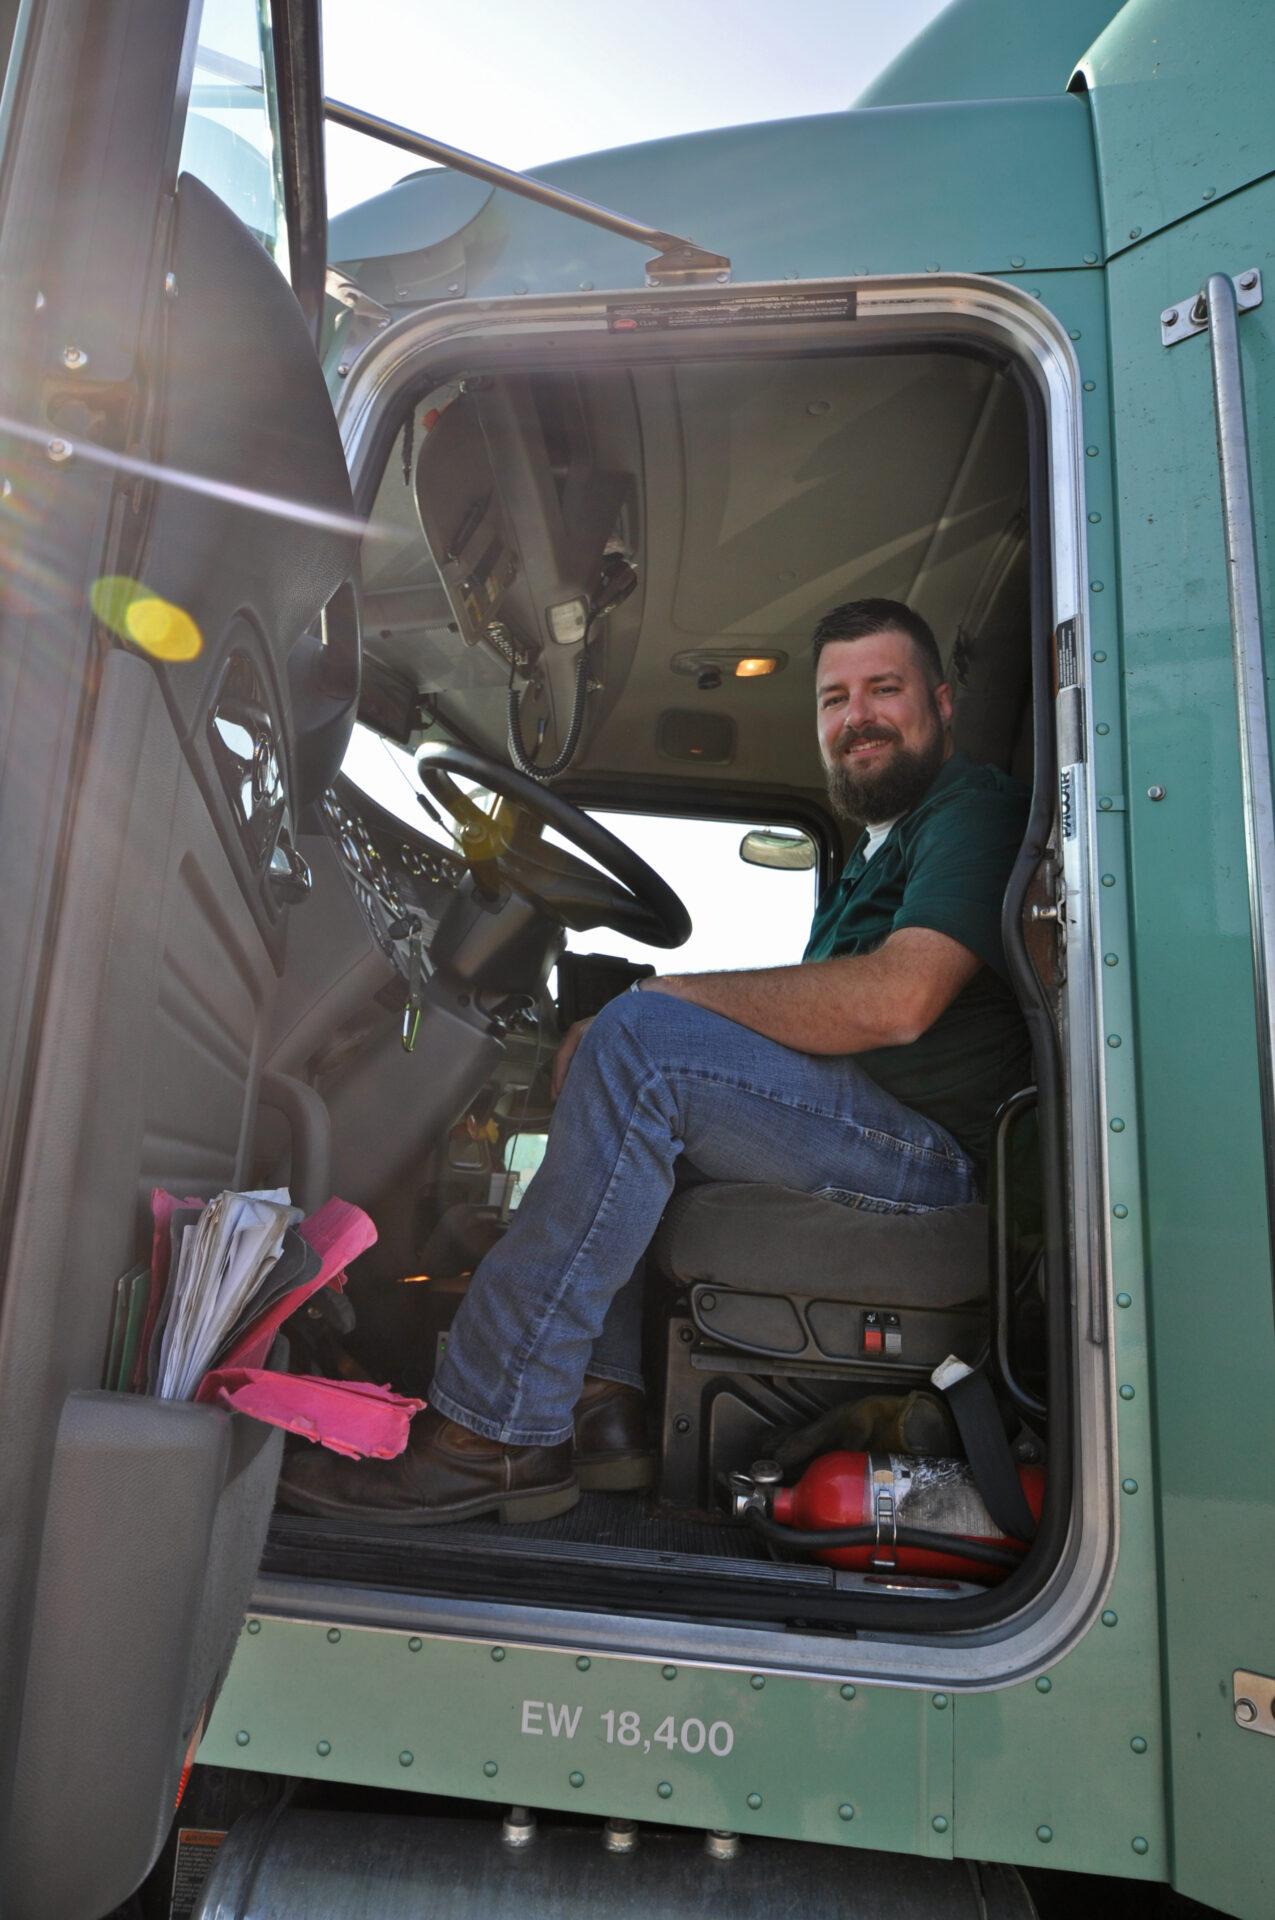 Luke Lish sitting in a semi truck.